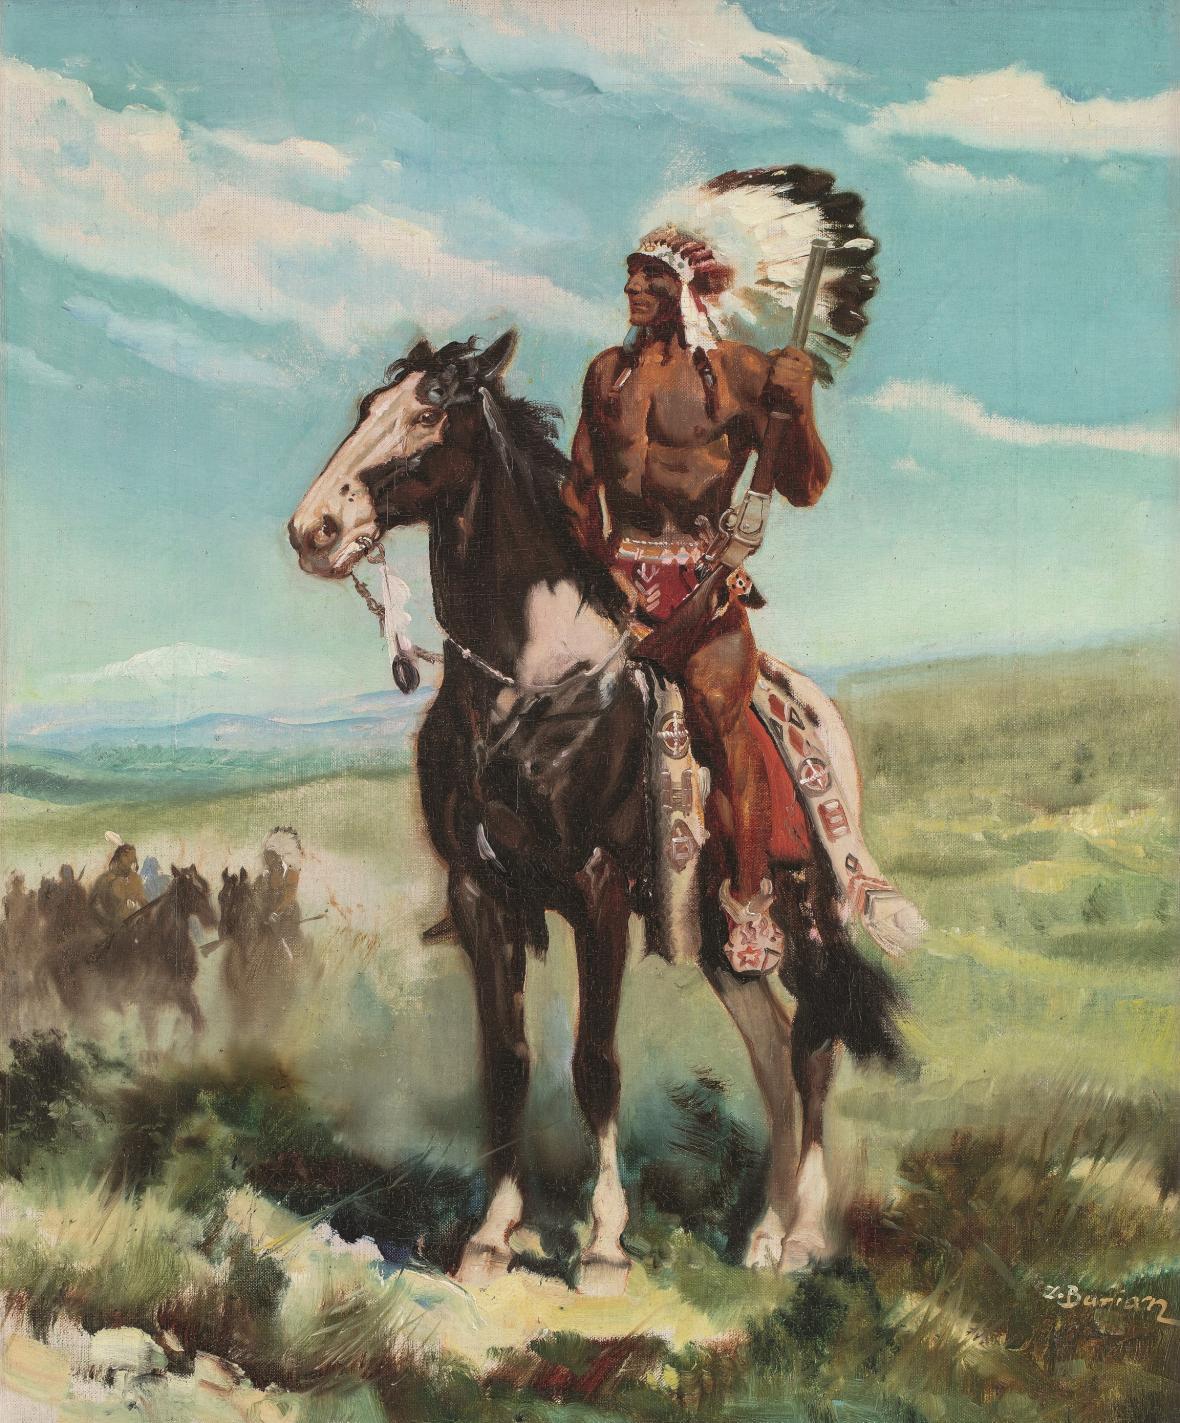 Vinnetou – Indiánské léto, obálka, 1939